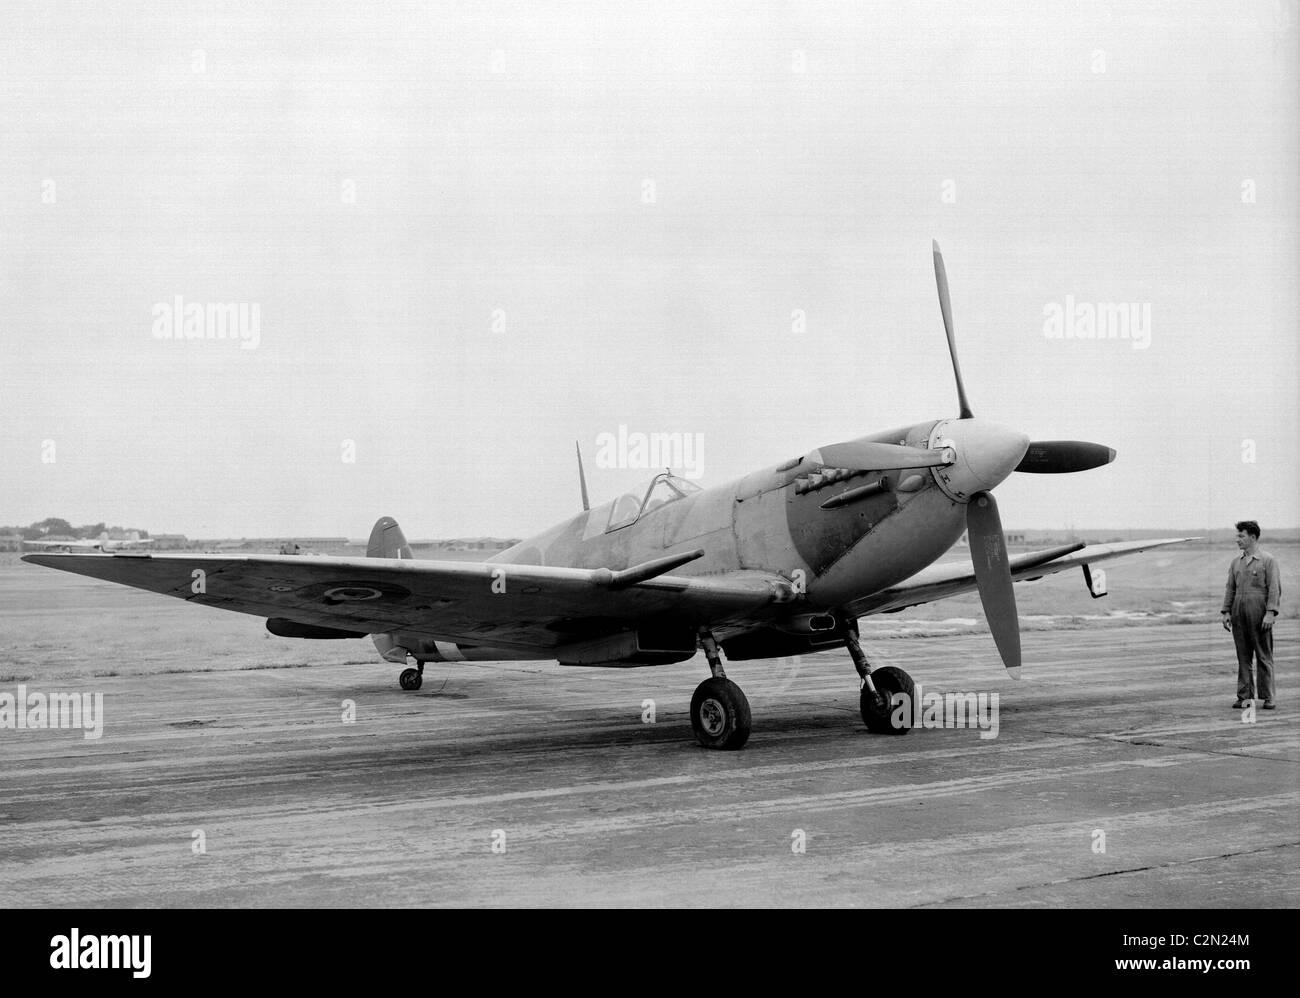 Supermarine Spitfire HF VII aircraft - Stock Image